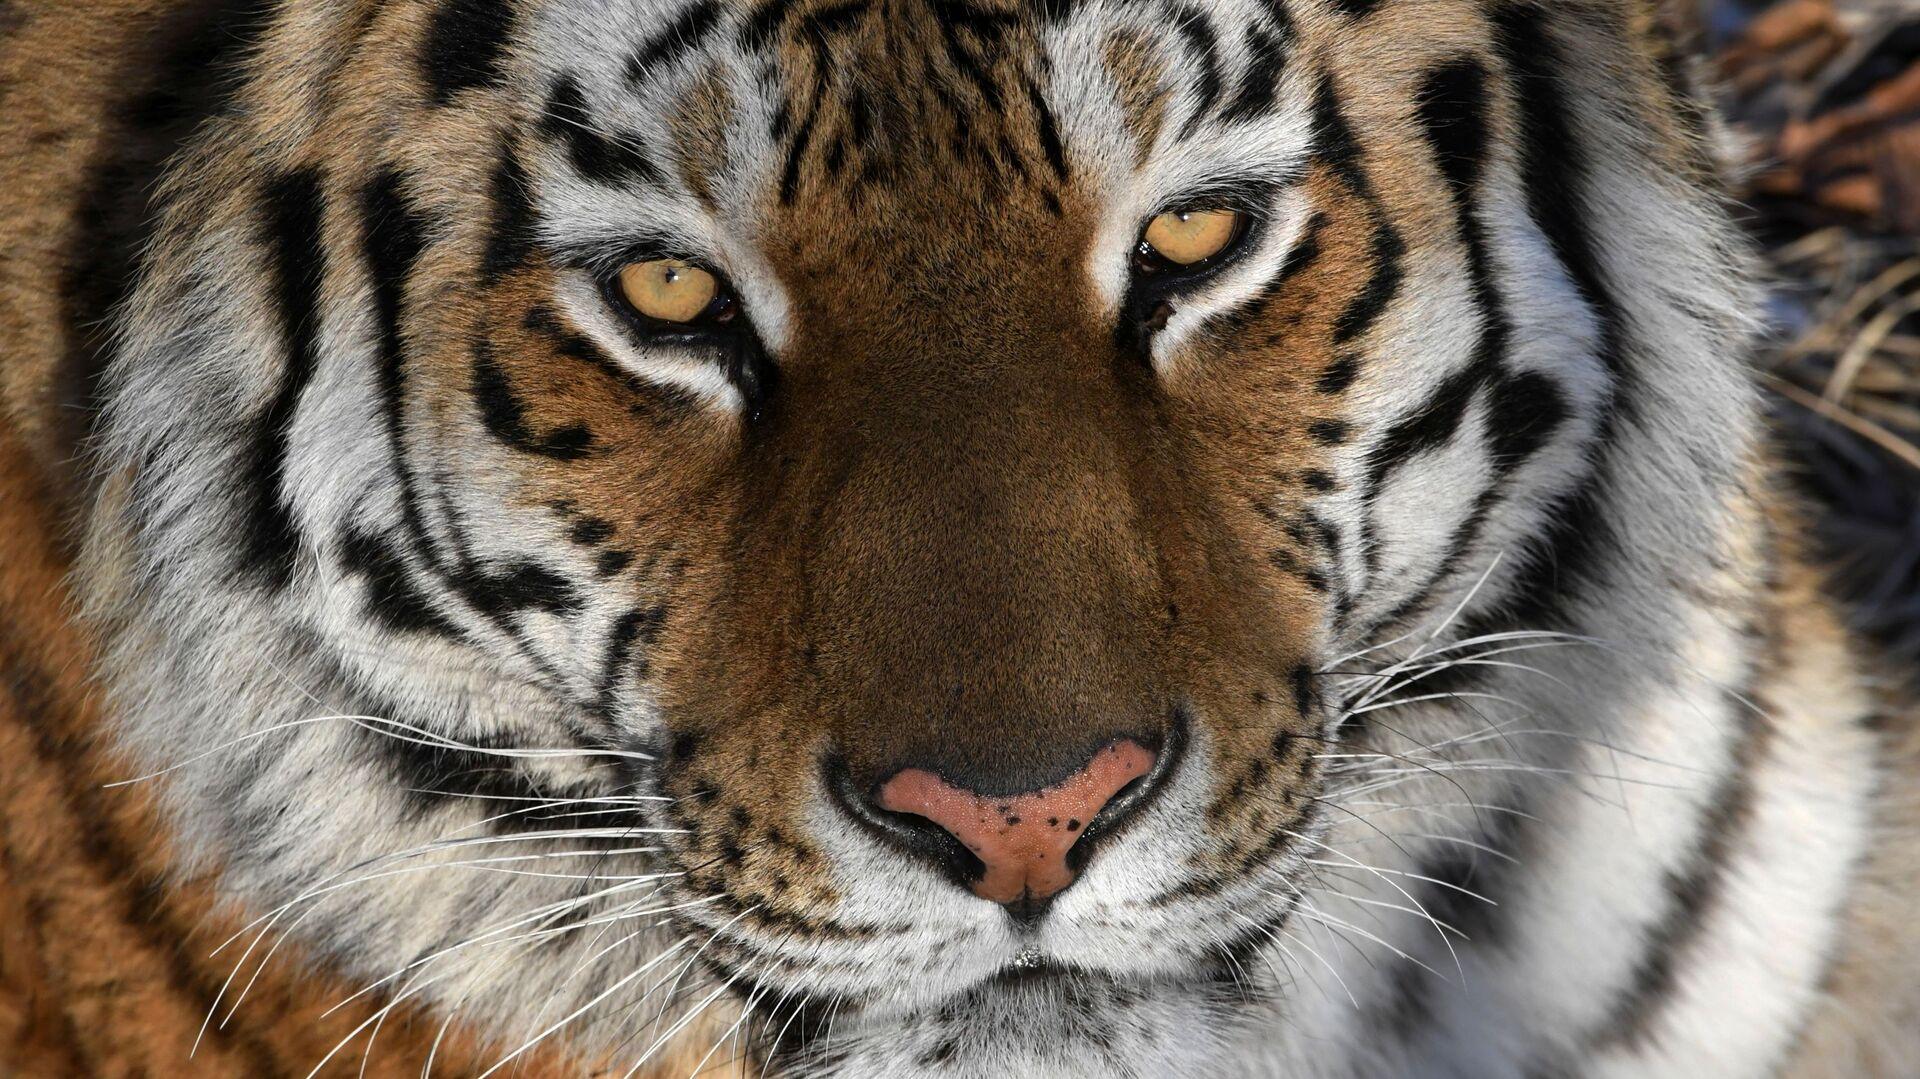 La tigre dell'Amur - Sputnik Italia, 1920, 09.06.2021